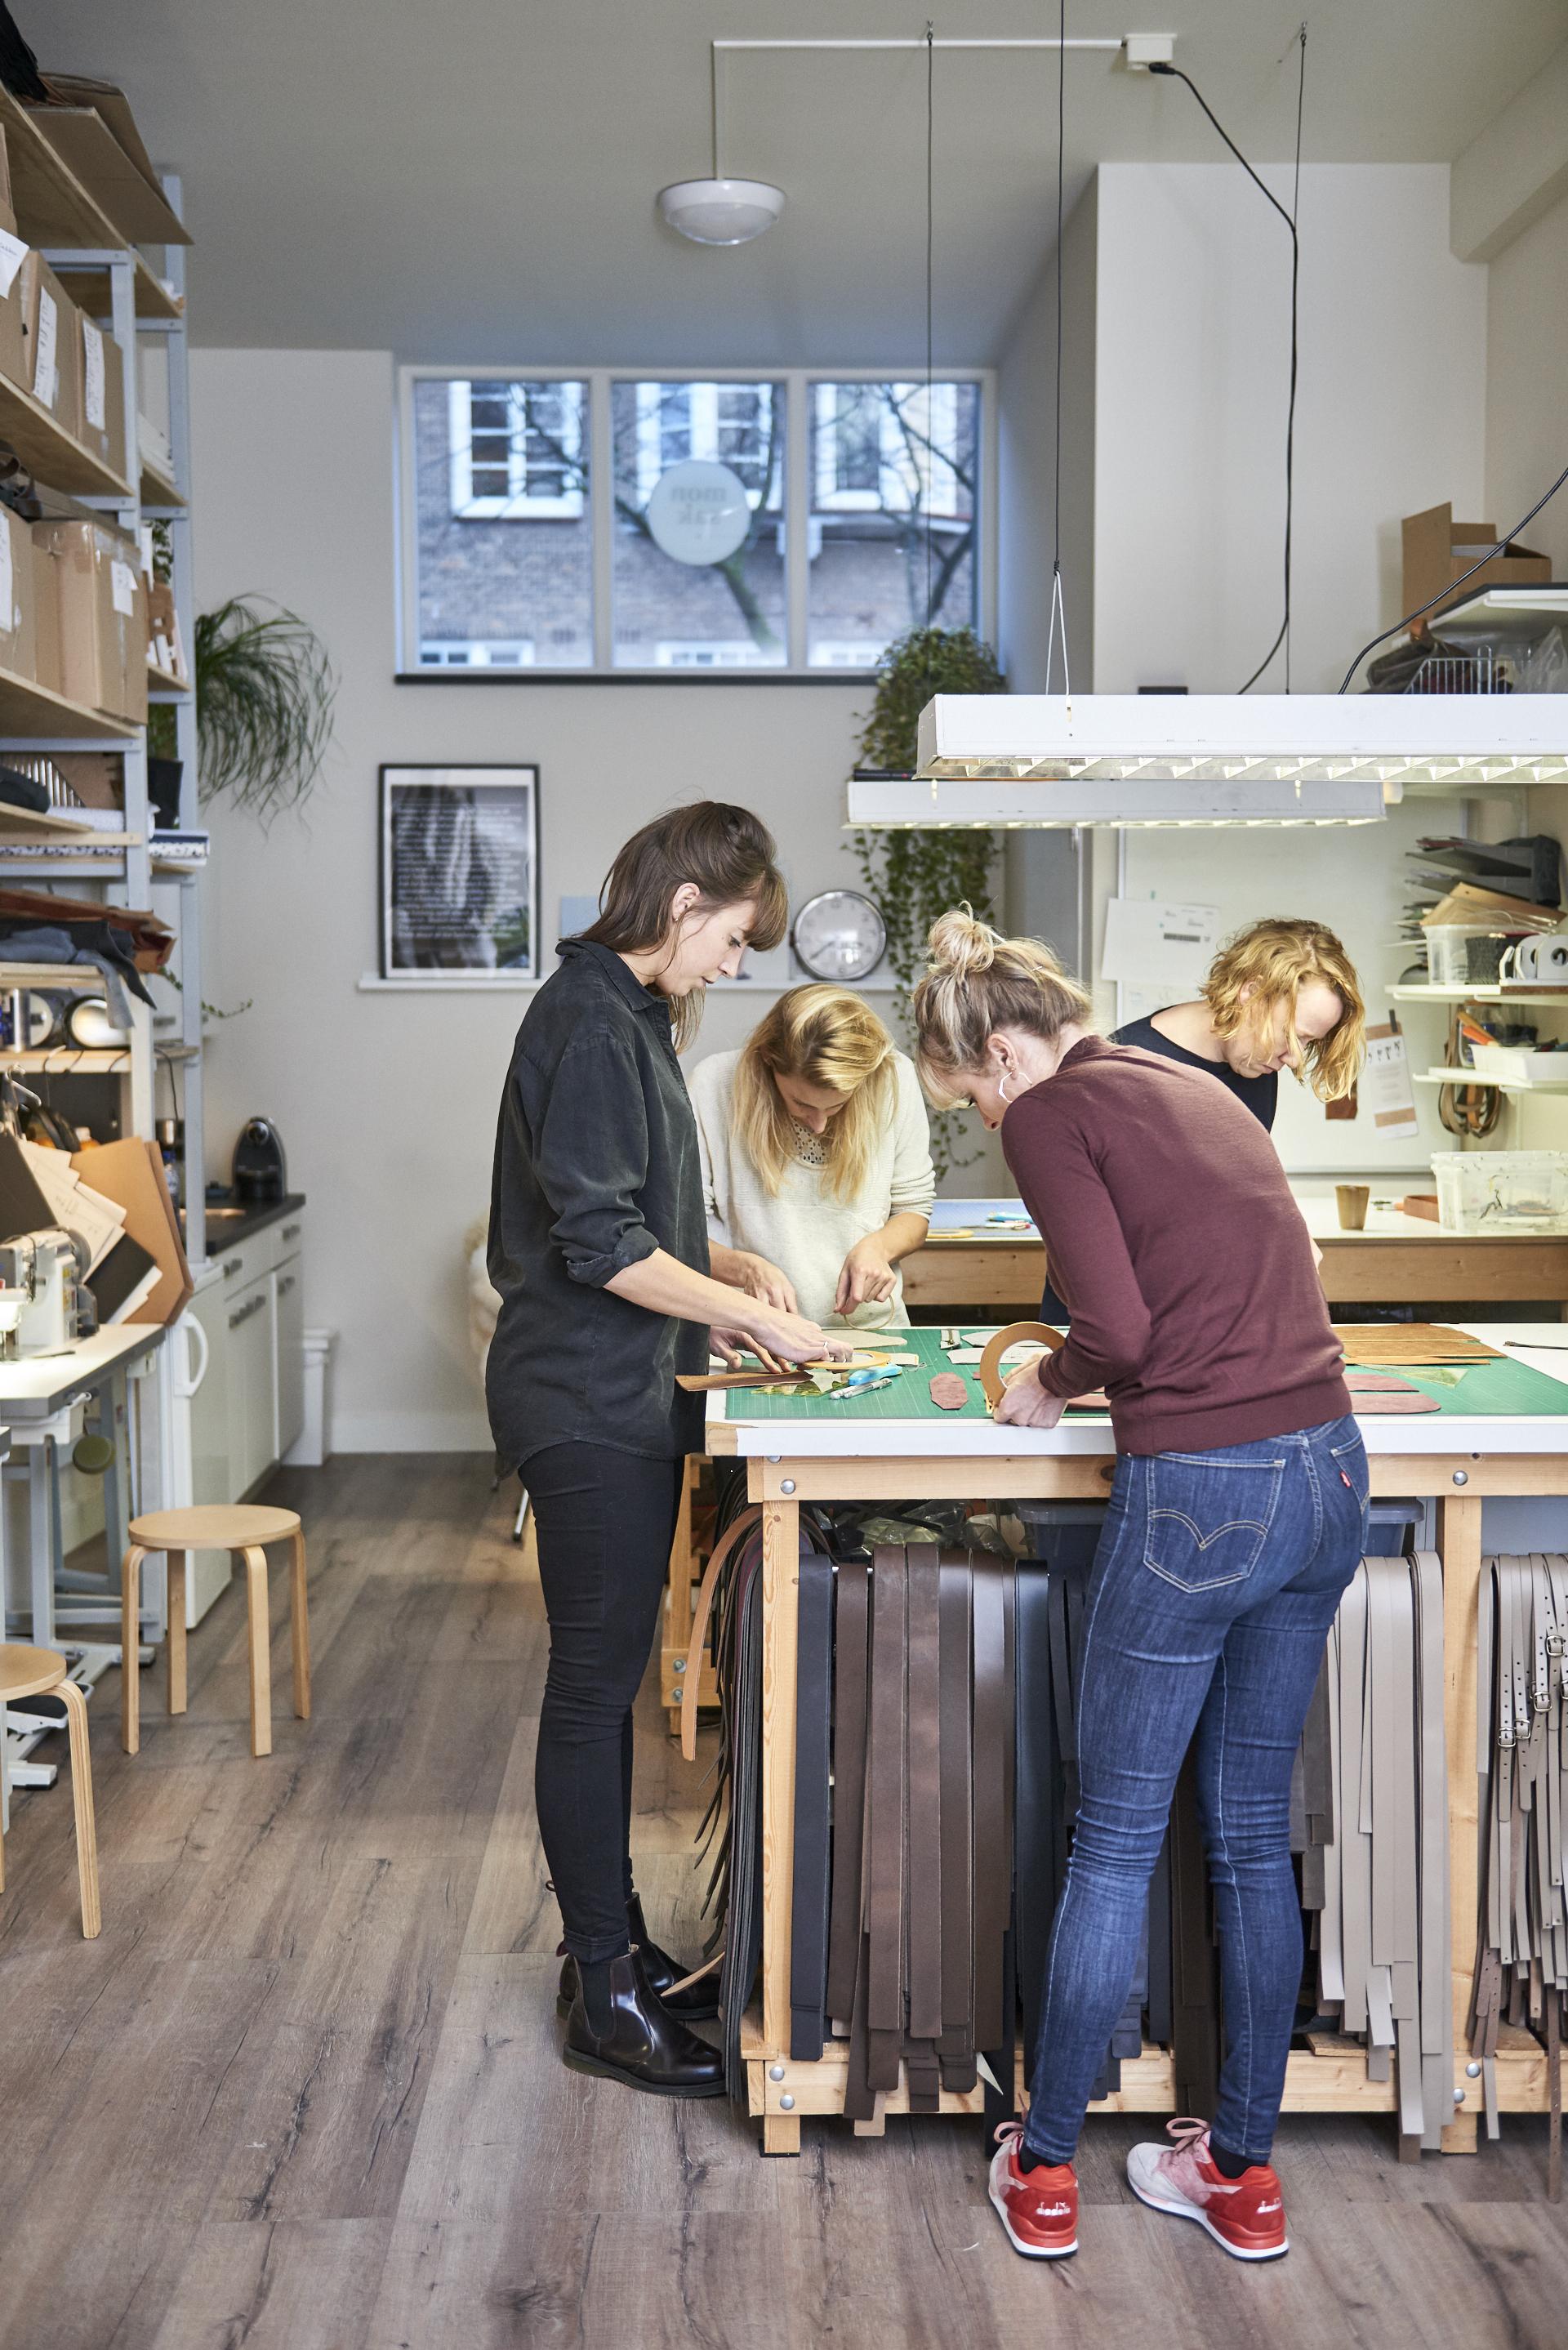 atelier-amsterdam-artist-monsak-unuelectricscooter.jpg